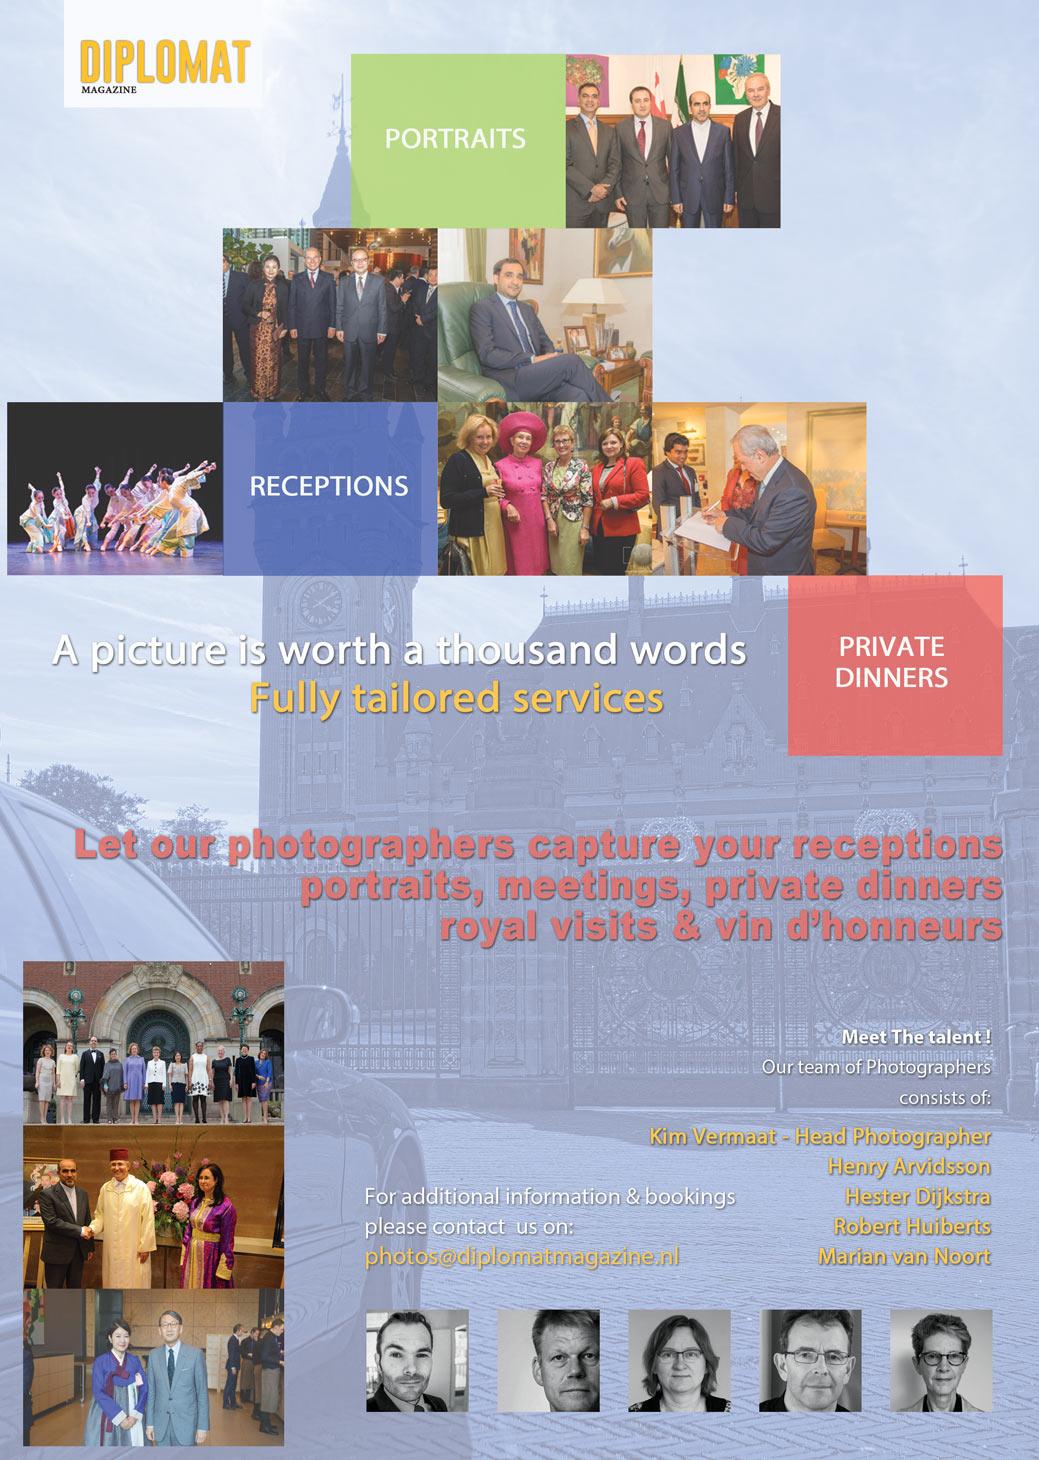 Hire a Pro photographer - Diplomat magazine : Diplomat magazine